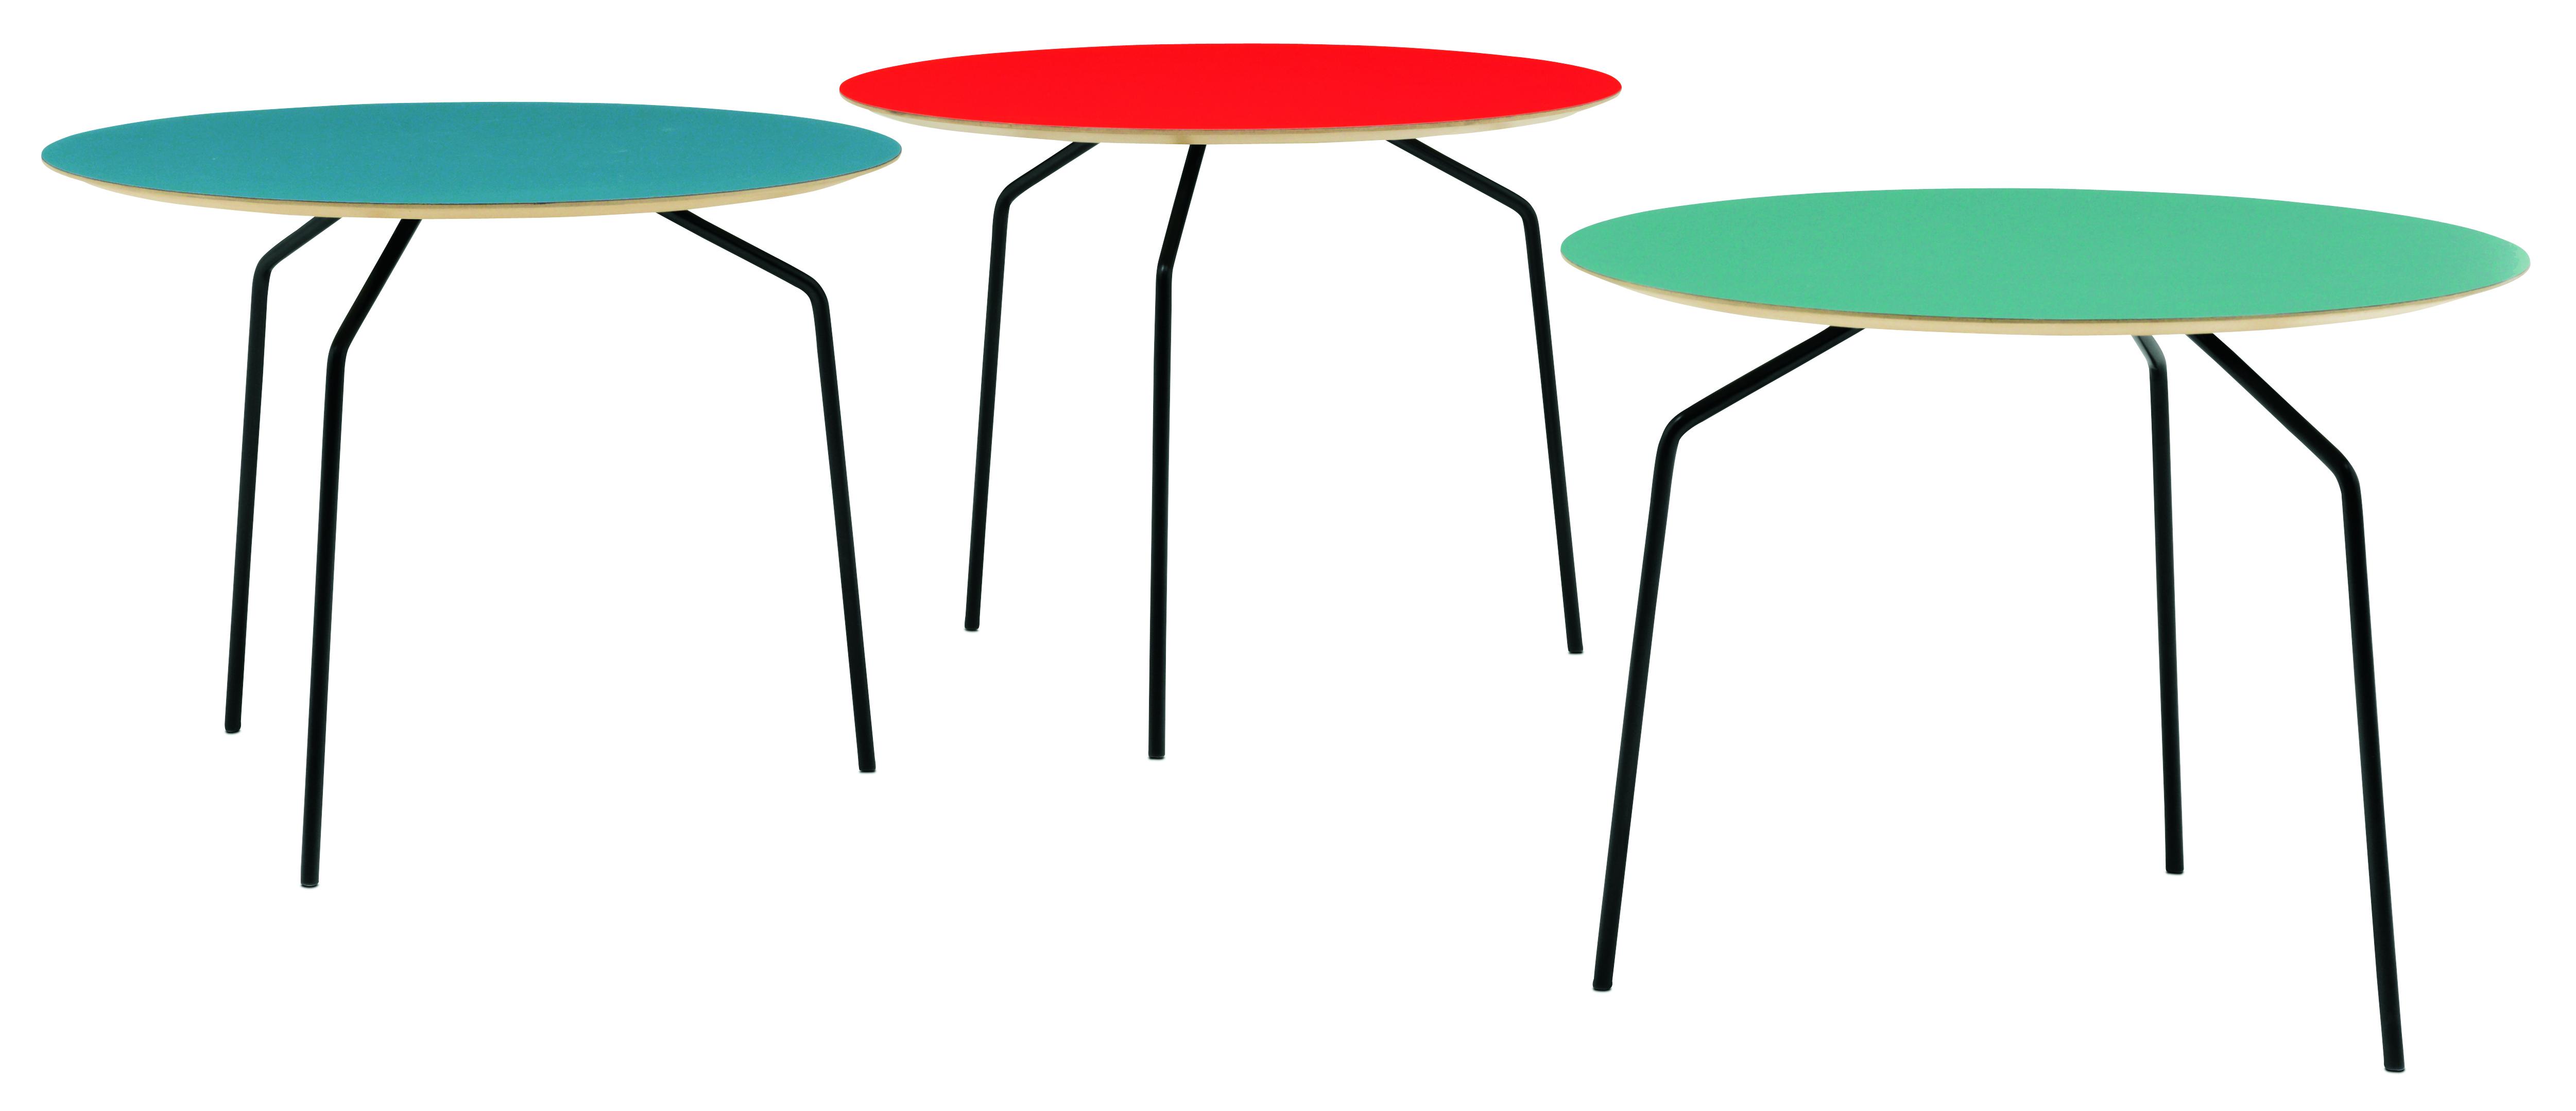 Boconcept Occa Side Table : side table  BoConcept Cambridge